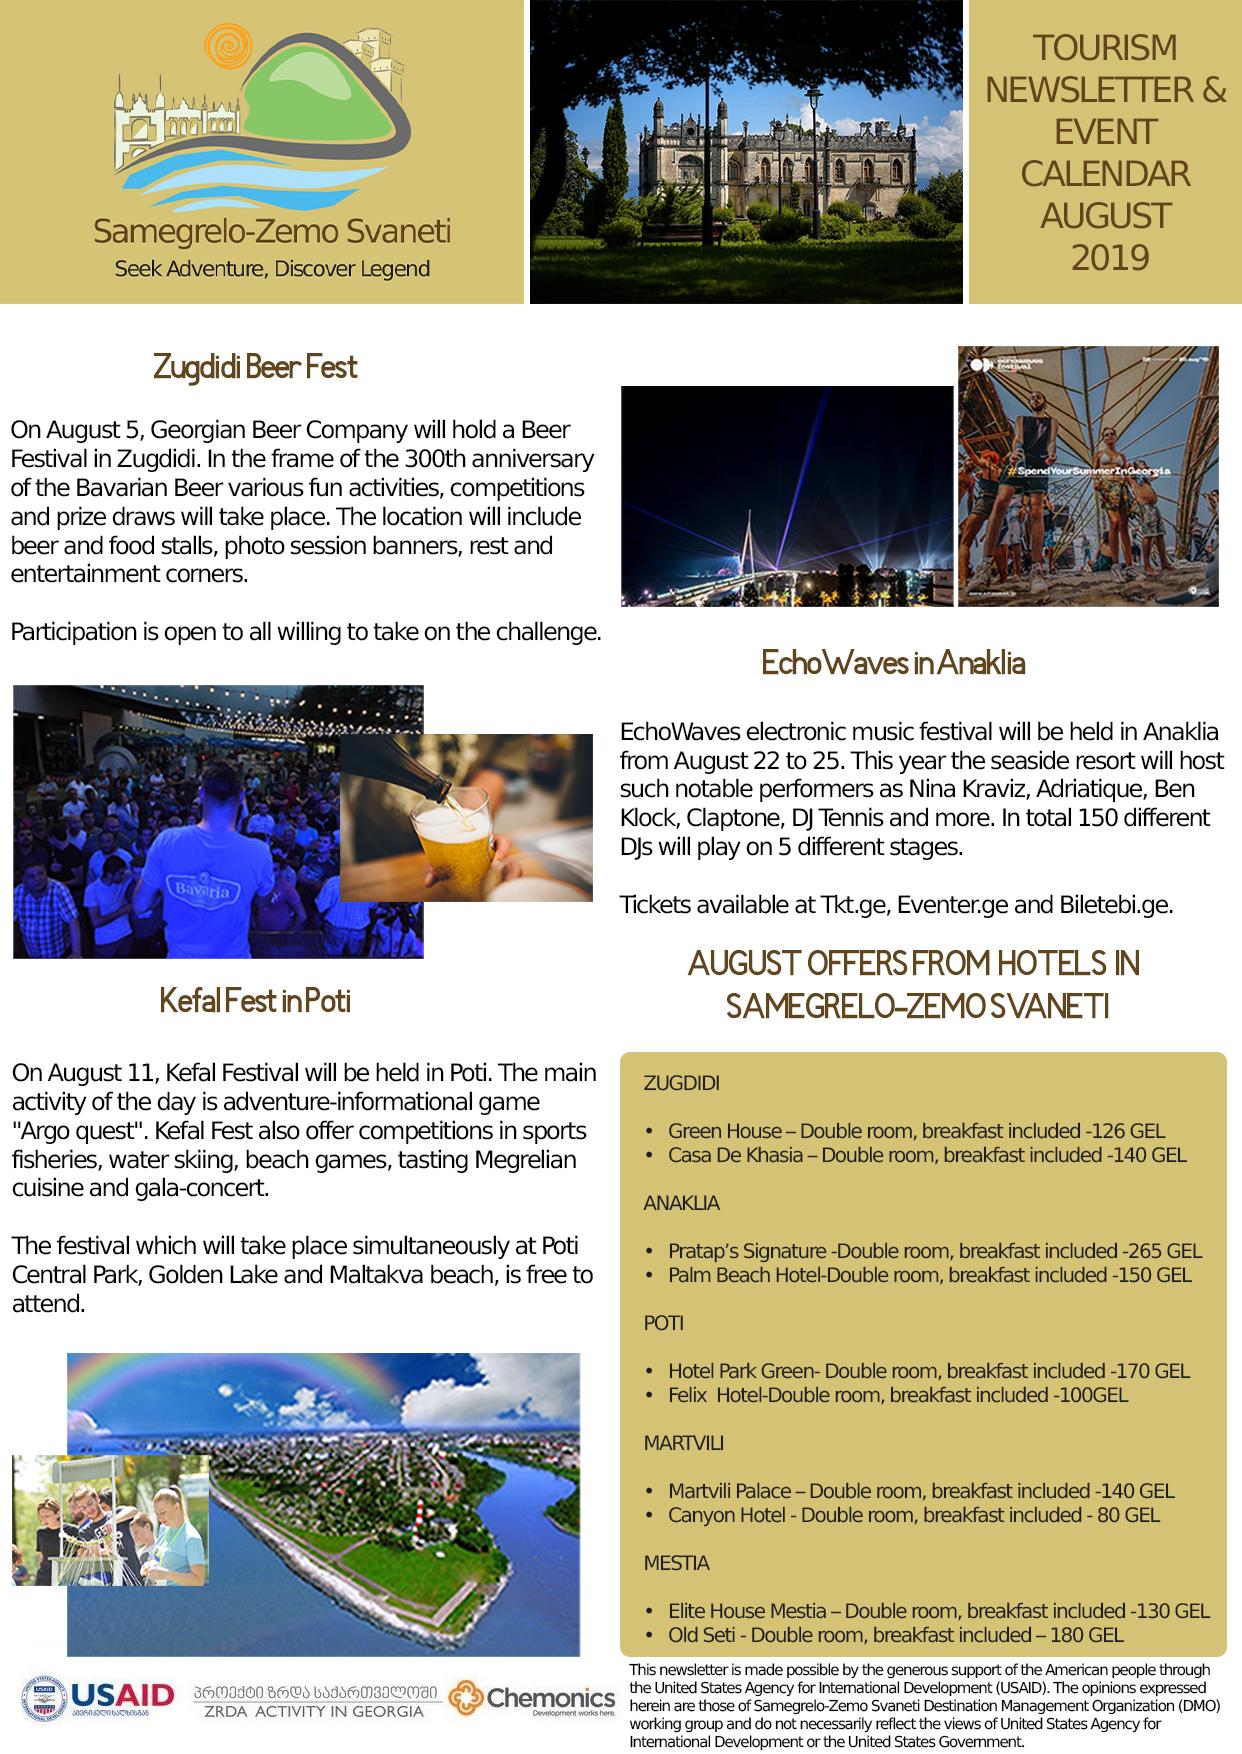 August Tourism Newsletter